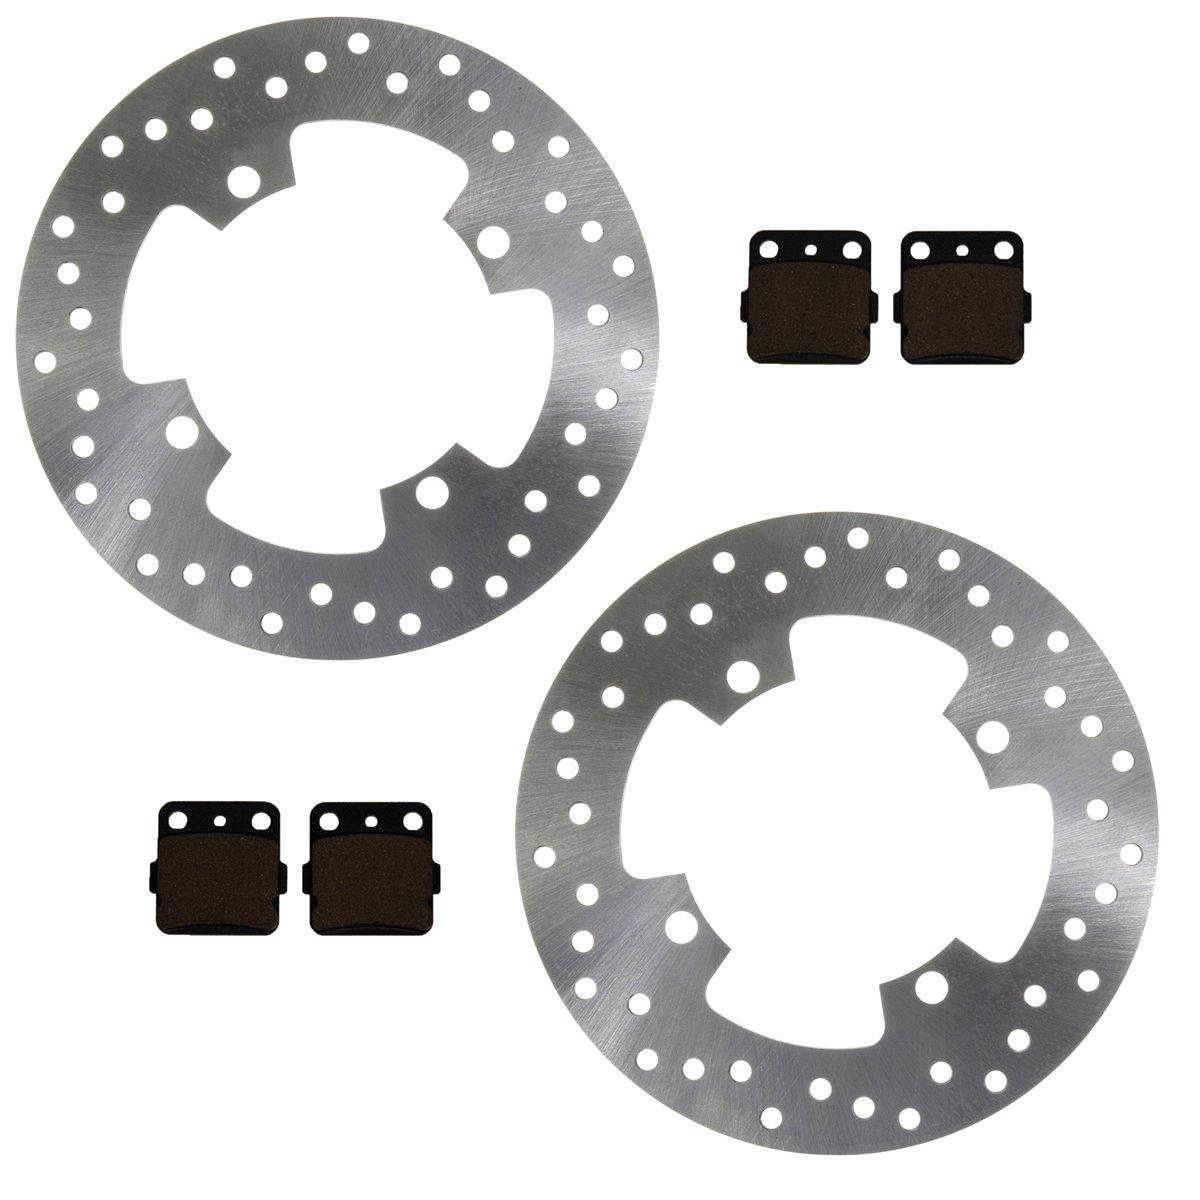 Factory Spec, (2) FS-2086 (2) FS-409, 2 Front Disc Brake Rotors & Semi-Metallic Brake Pads 2002-2008 Yamaha Grizzly 660 4x4 YFM660F